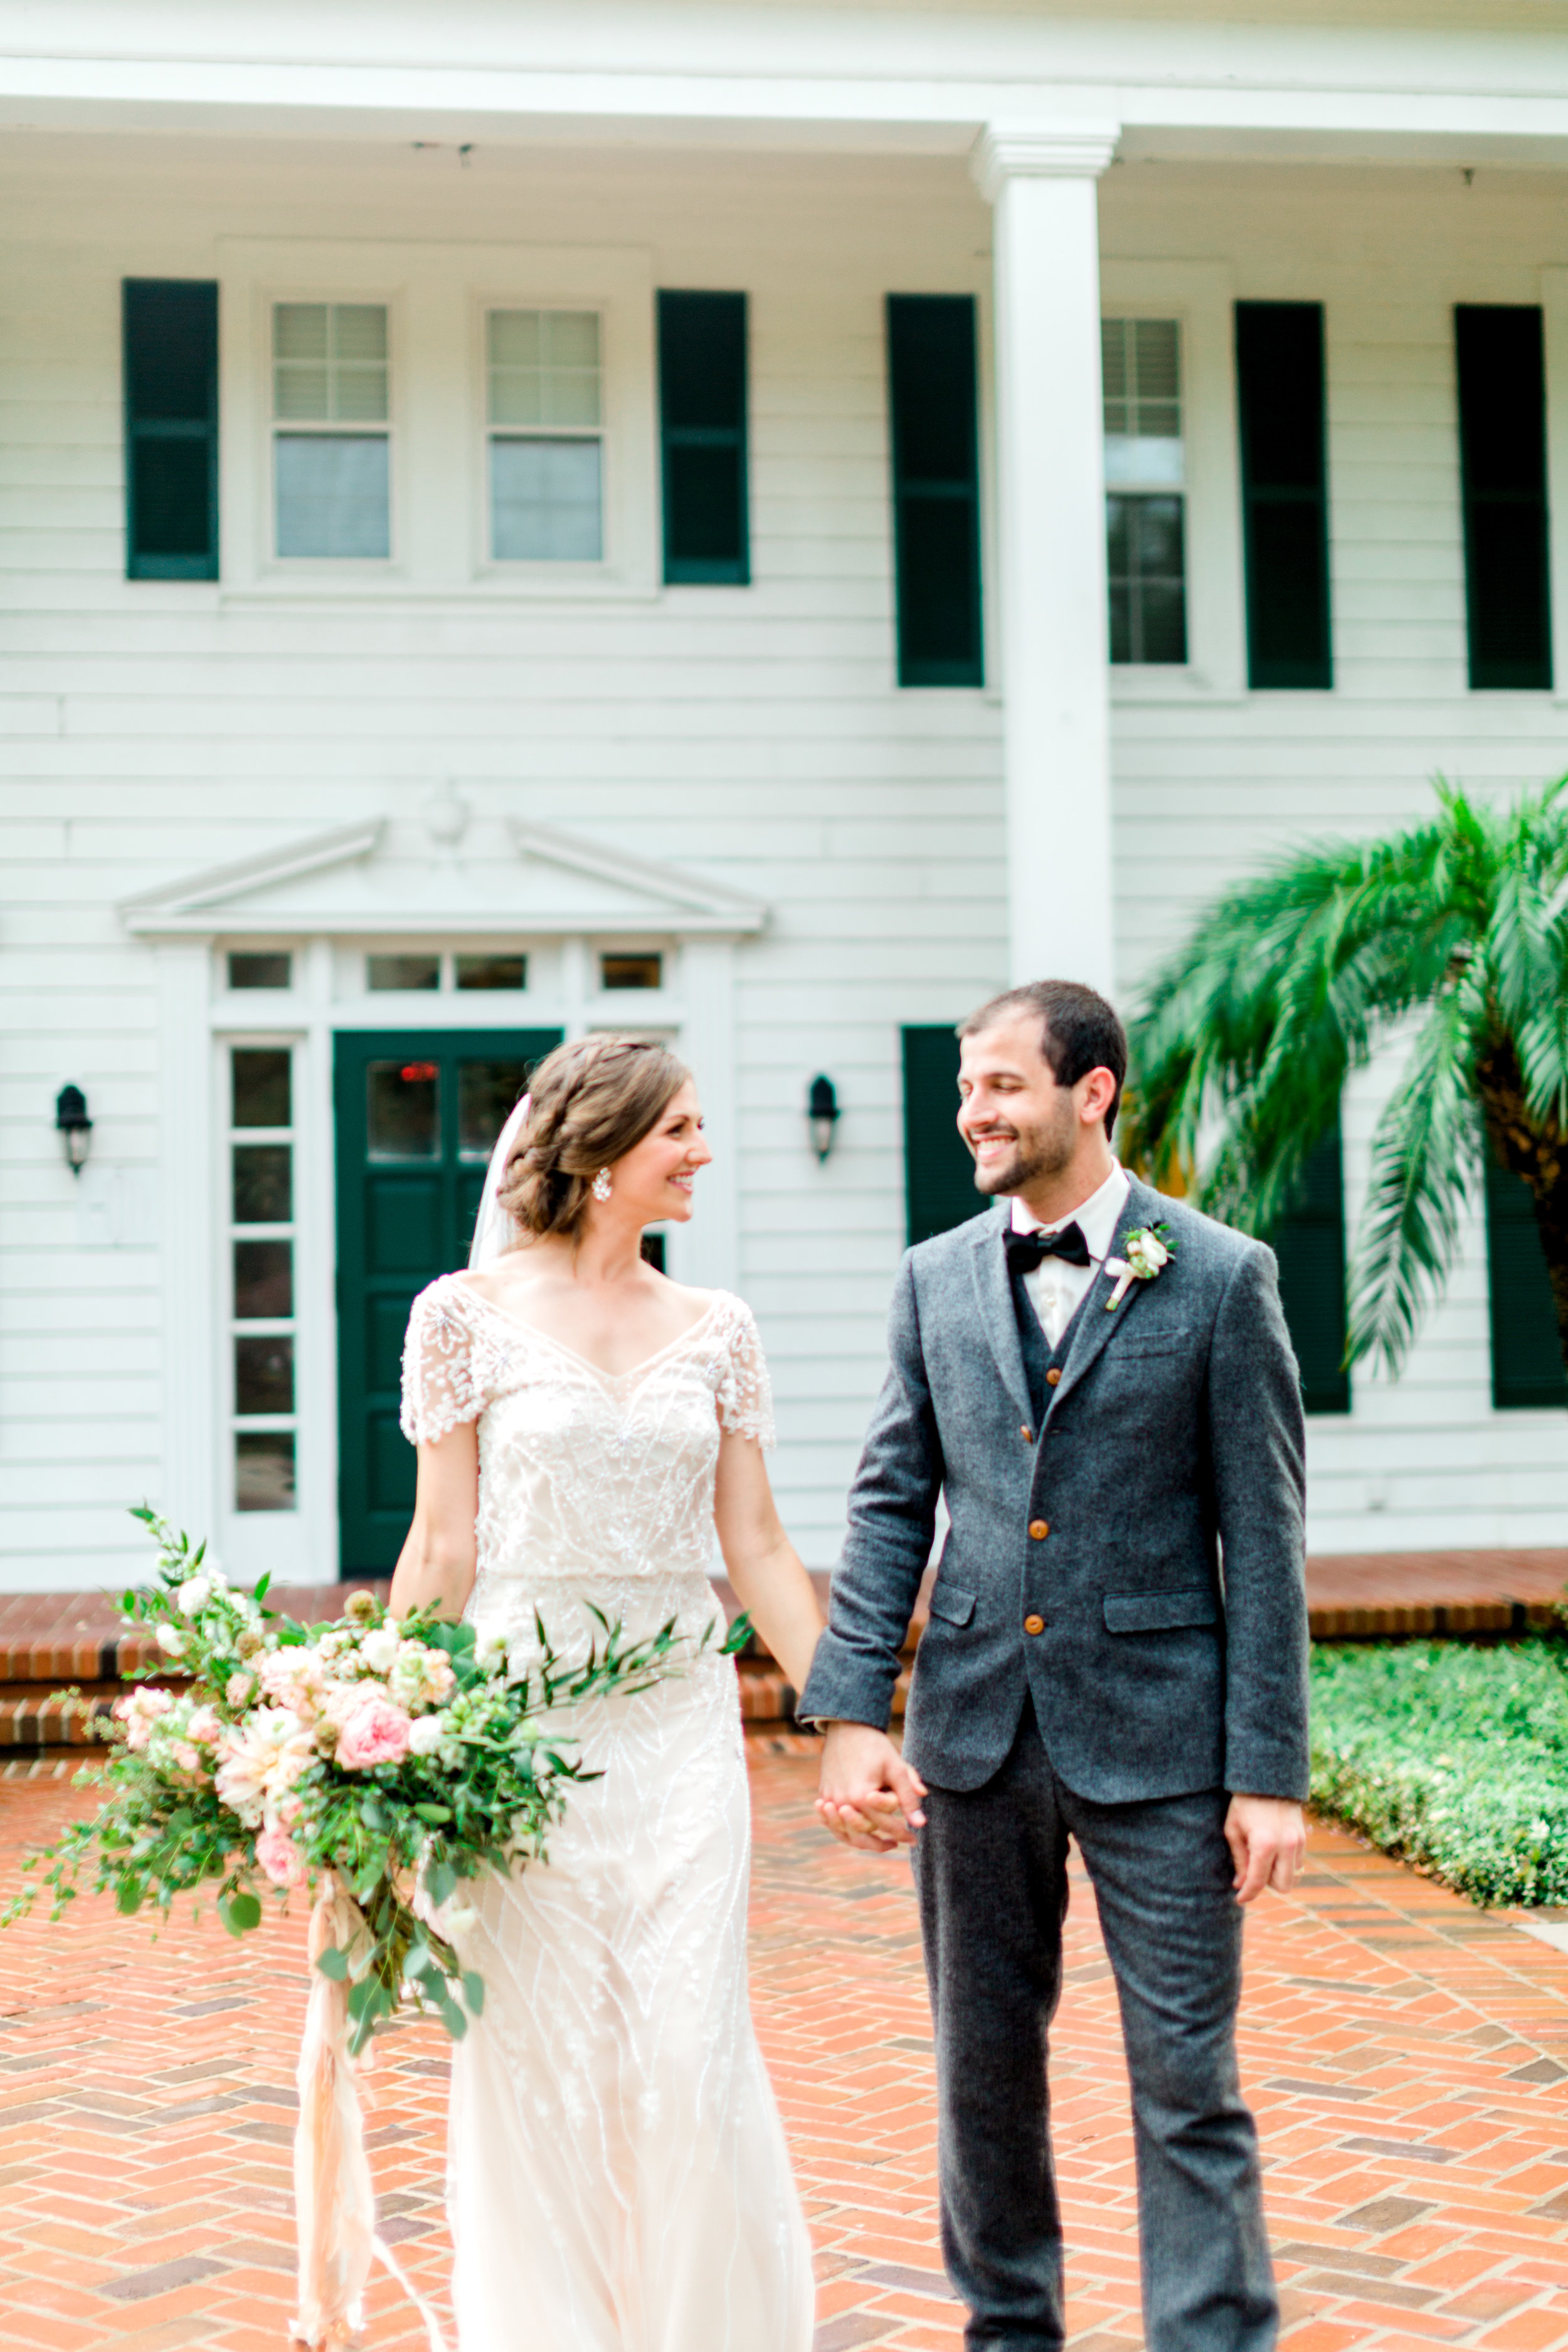 cypress grove estate house orlando florida wedding photos, bride and groom